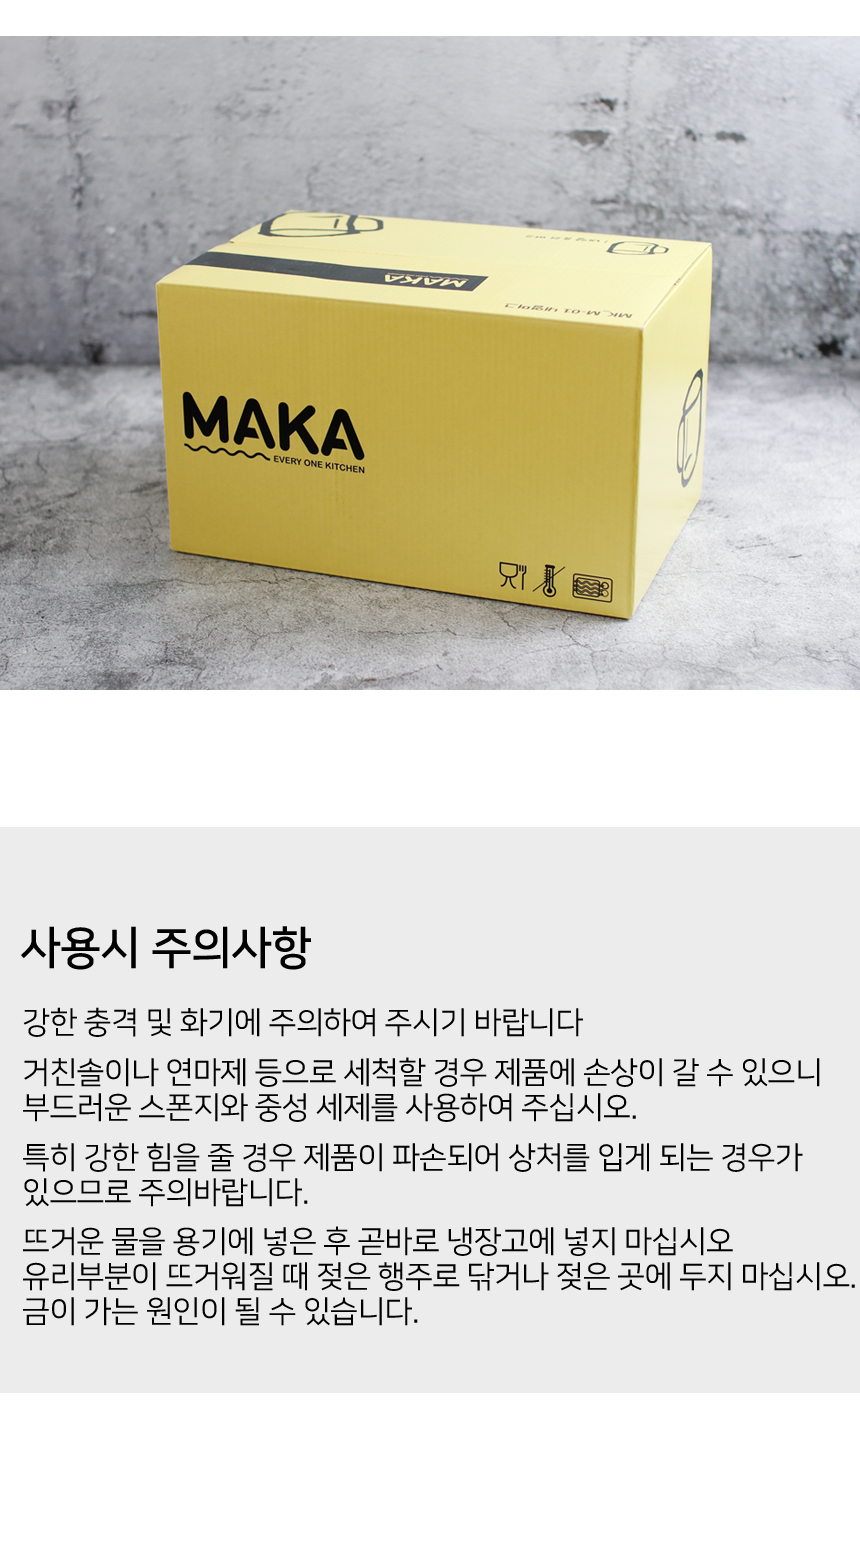 MAKA 내열유리 손잡이유리컵 430ml 6P세트(M04) - 김씨하우스, 28,000원, 유리컵/술잔, 유리컵